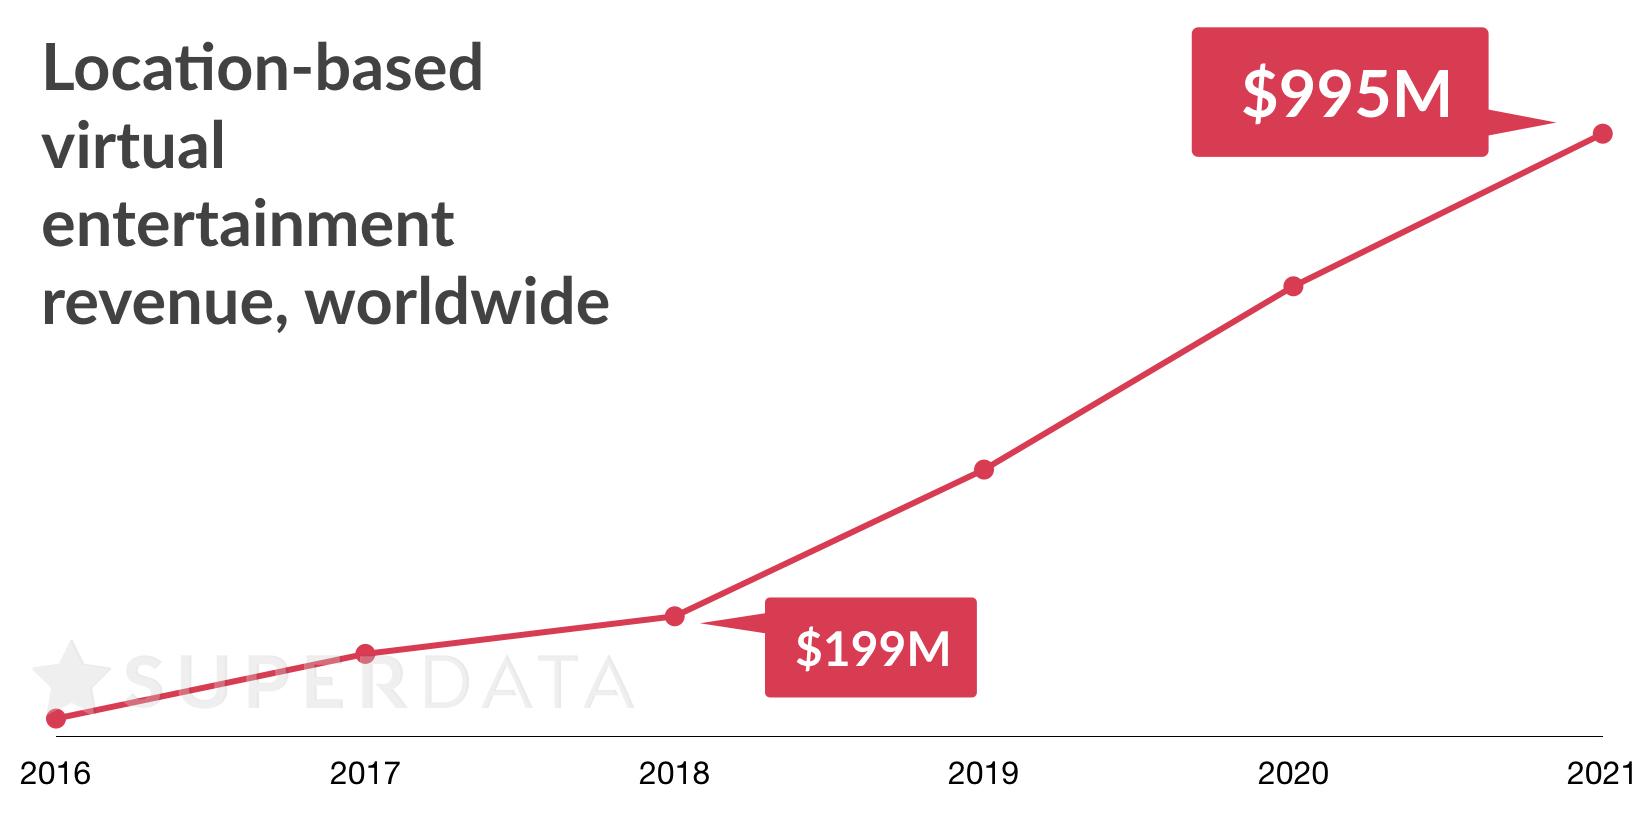 2018_0719_LBE VR revenue graph.SuperData Research.jpeg